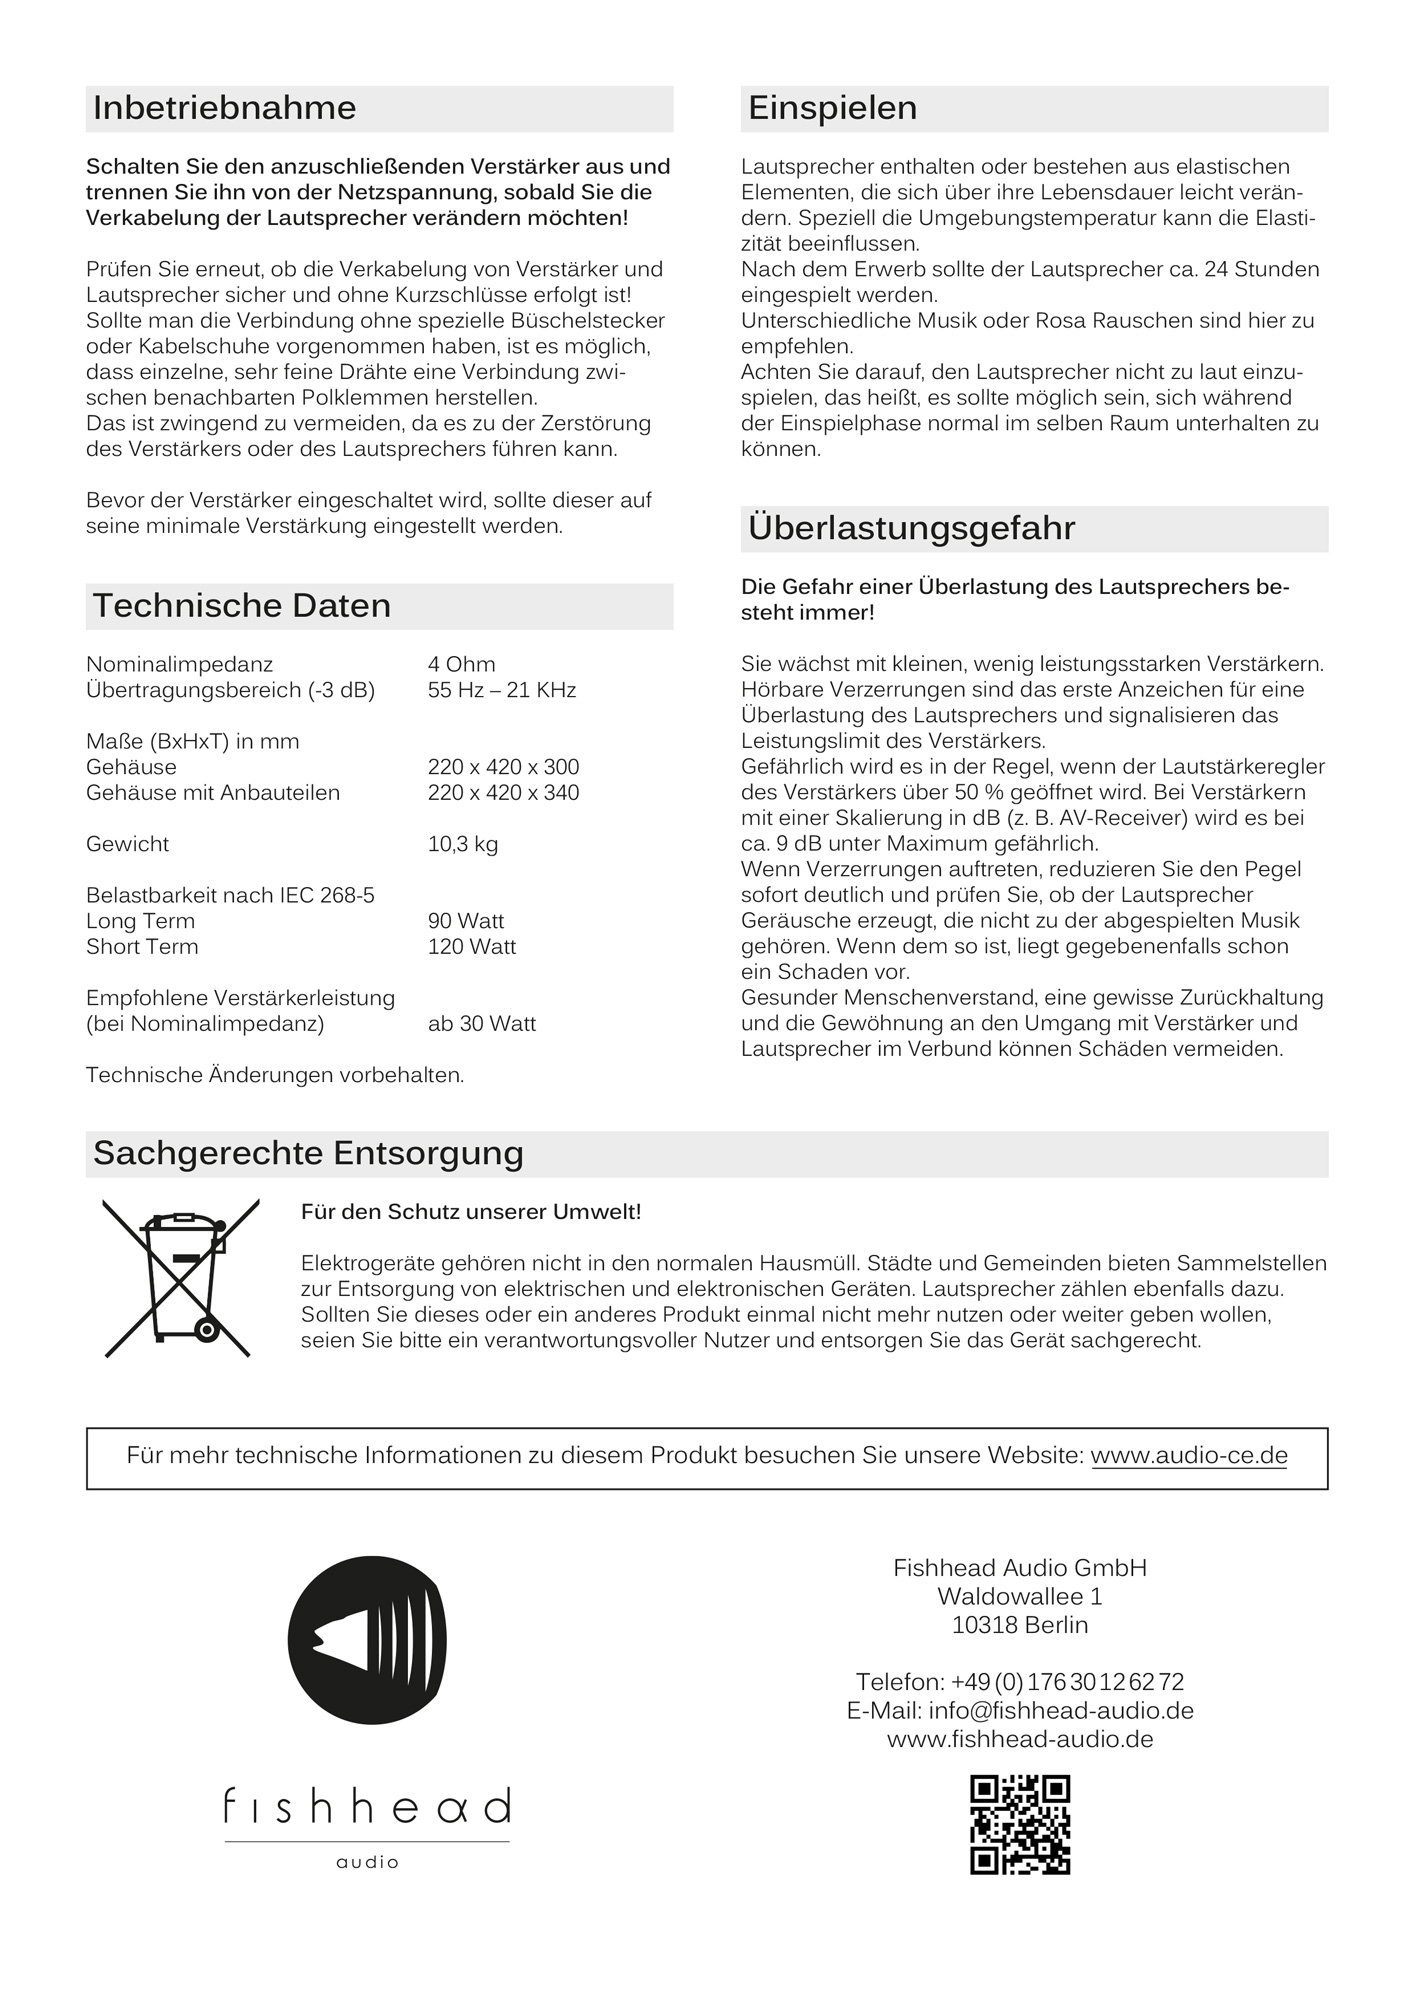 Fishhead Audio Resolution 1.6 BS - Manual